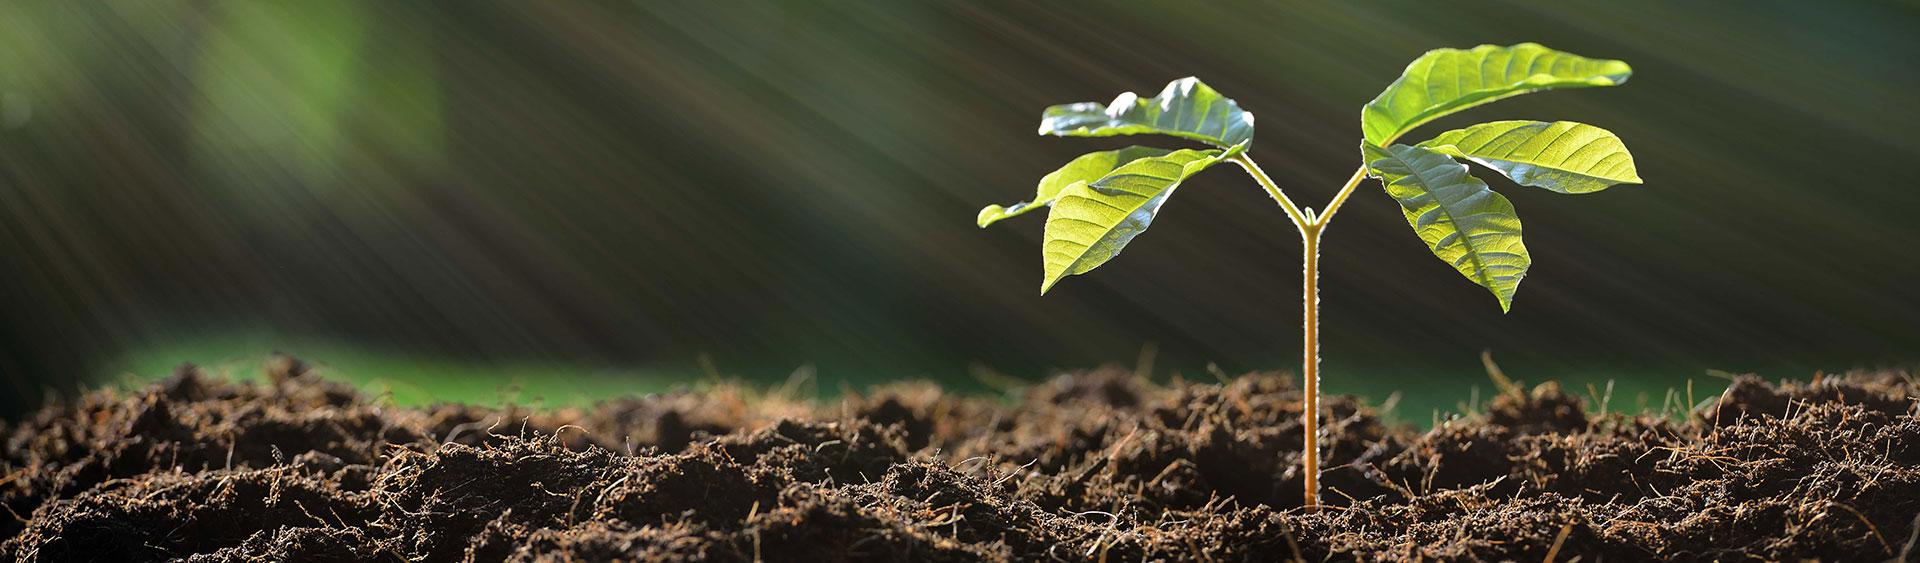 eco-plant